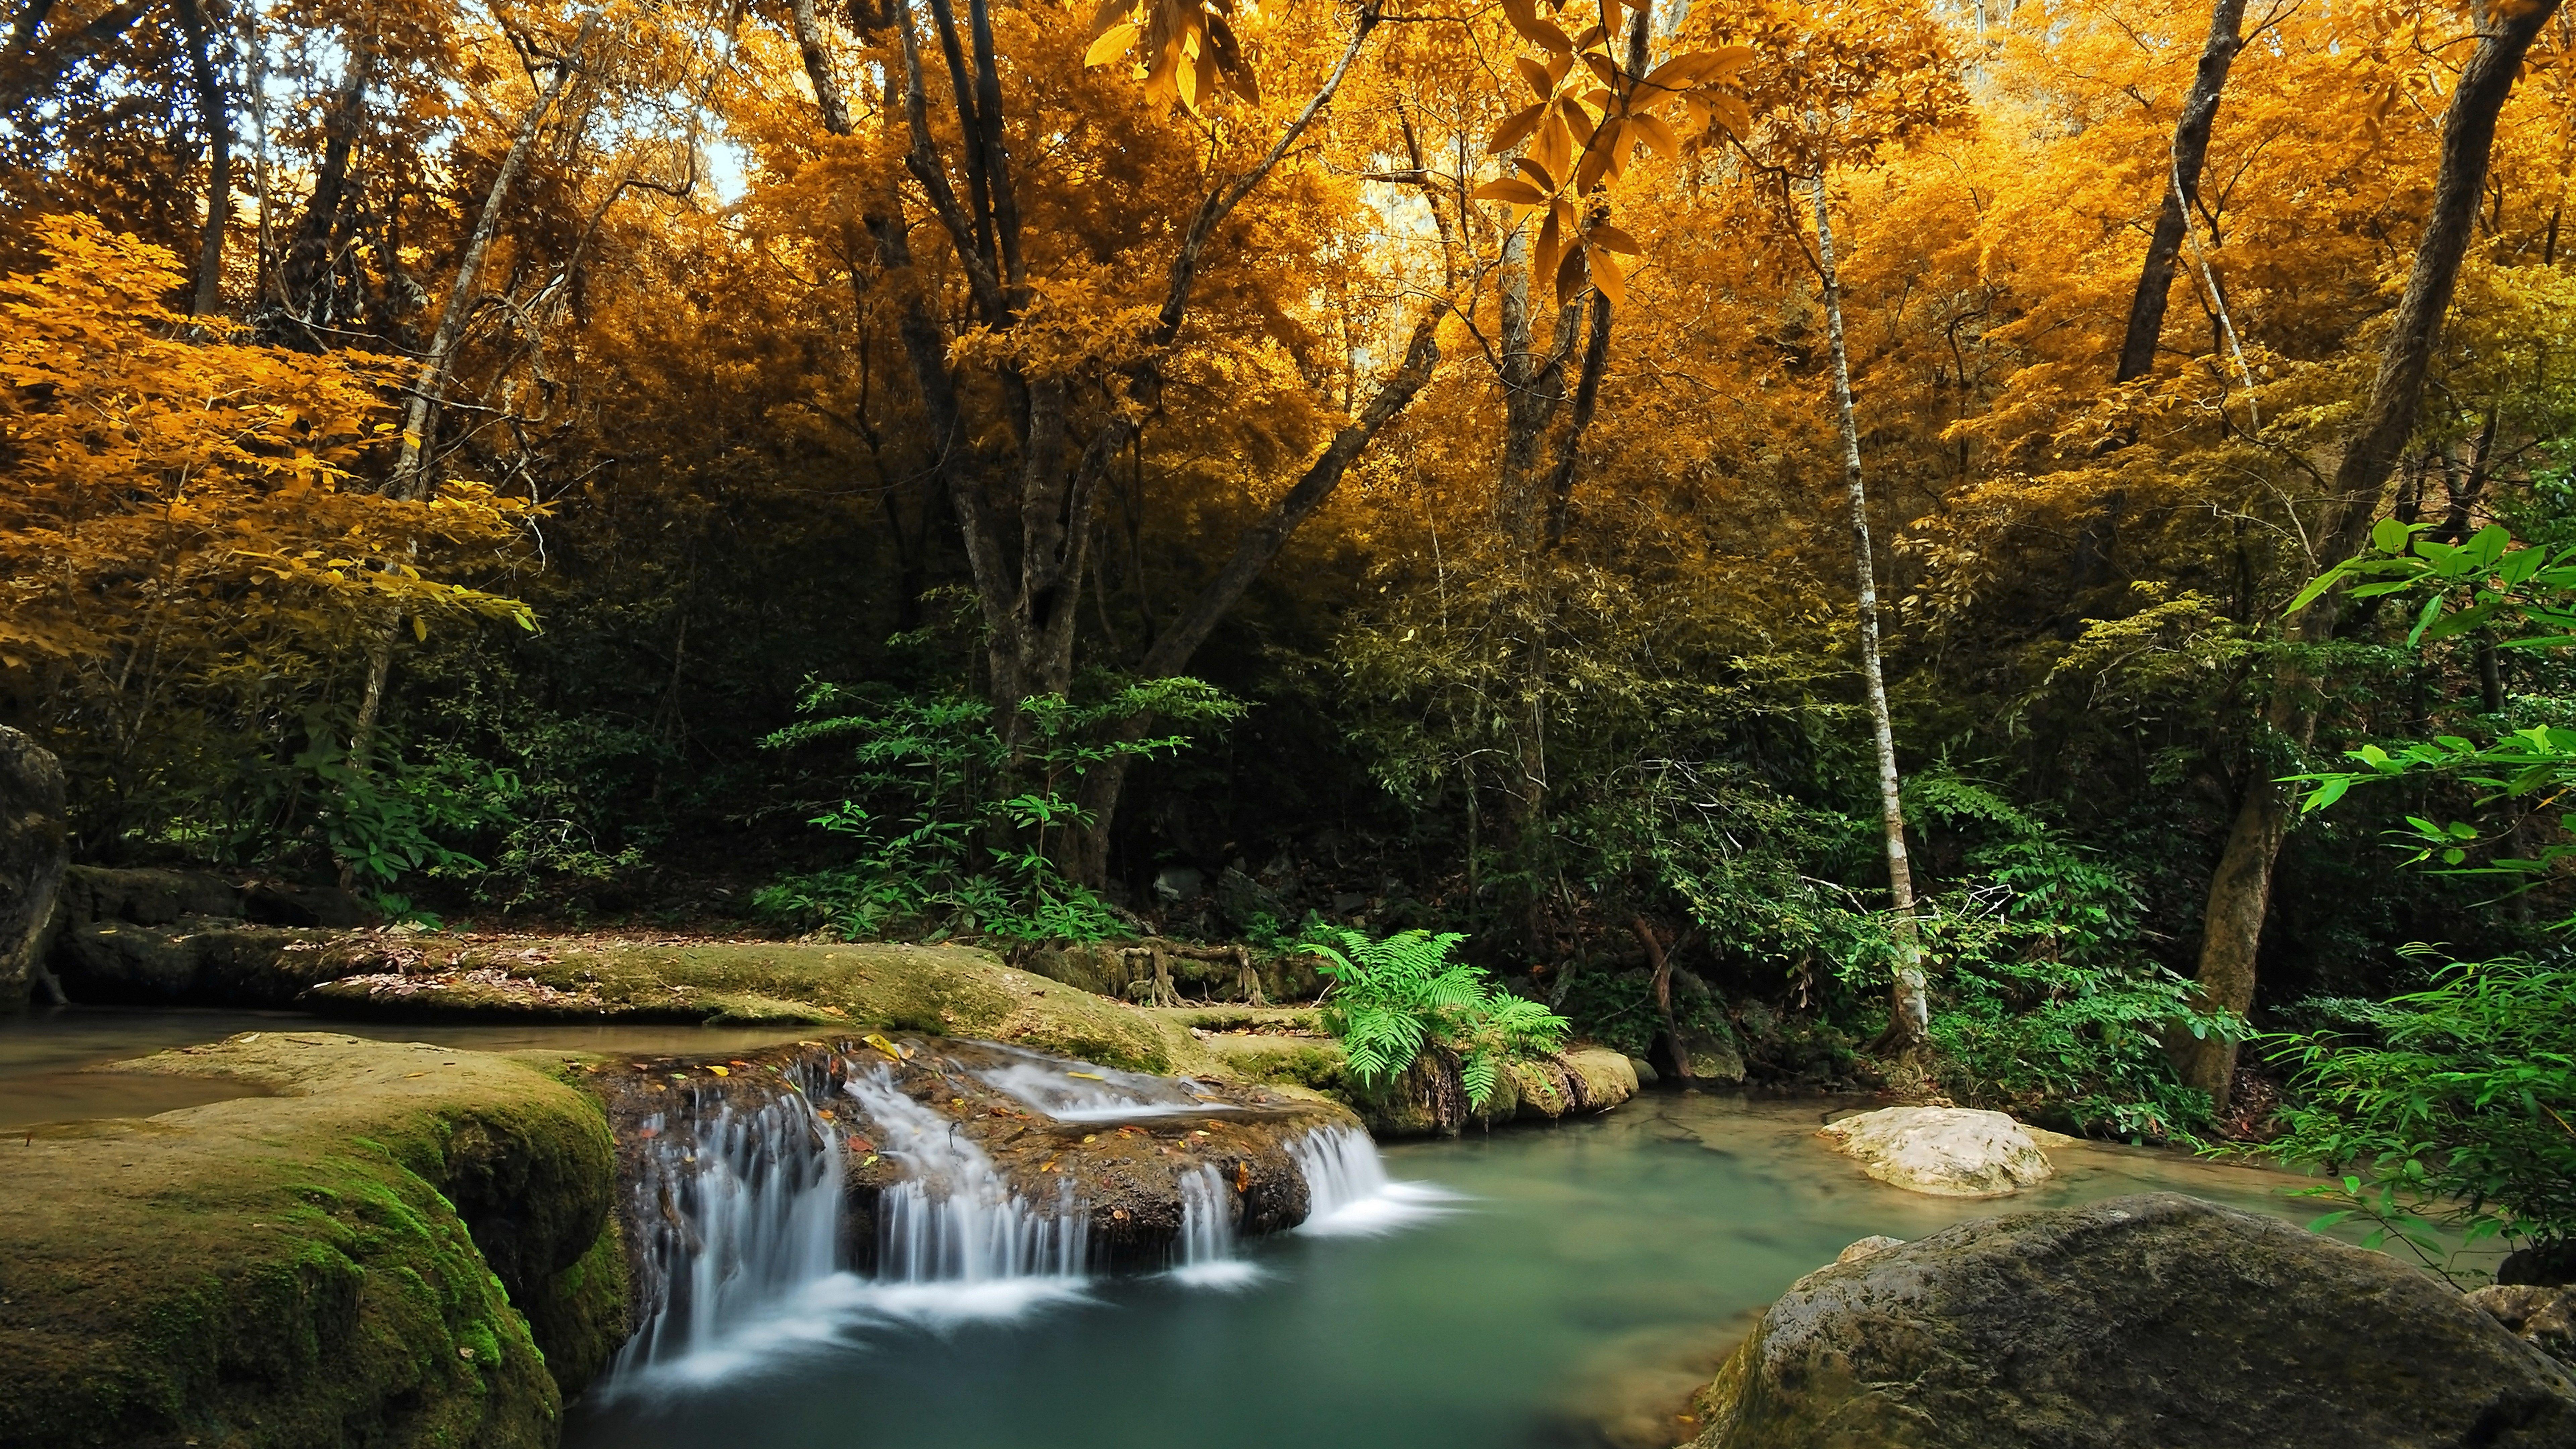 8k wallpaper nature inspired   ololoshenka   Waterfall wallpaper, Forest waterfall, Forest view